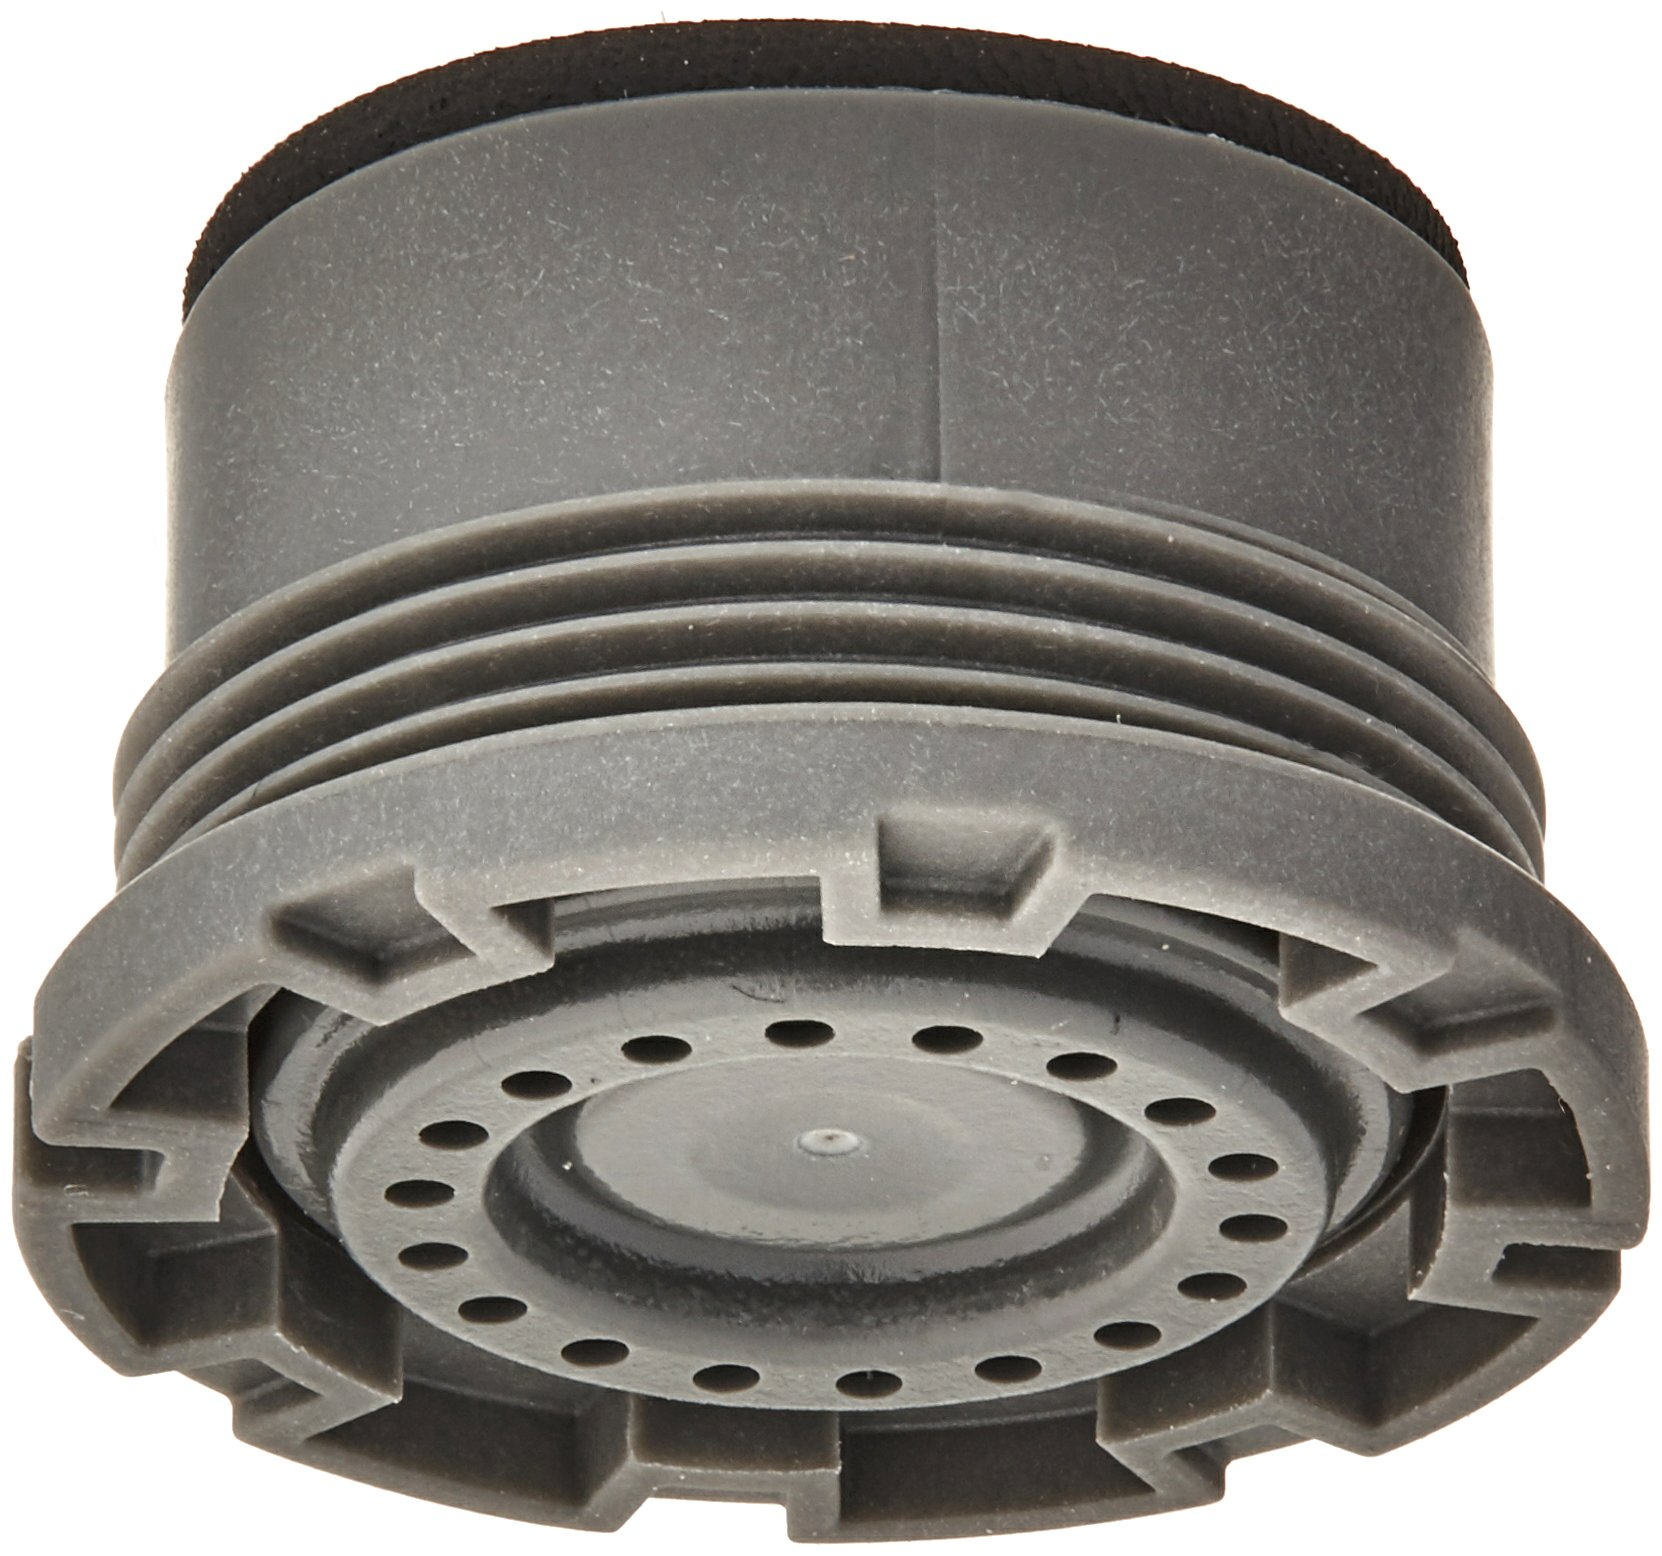 Delta Faucet RP72676 .35 GPM Aerator